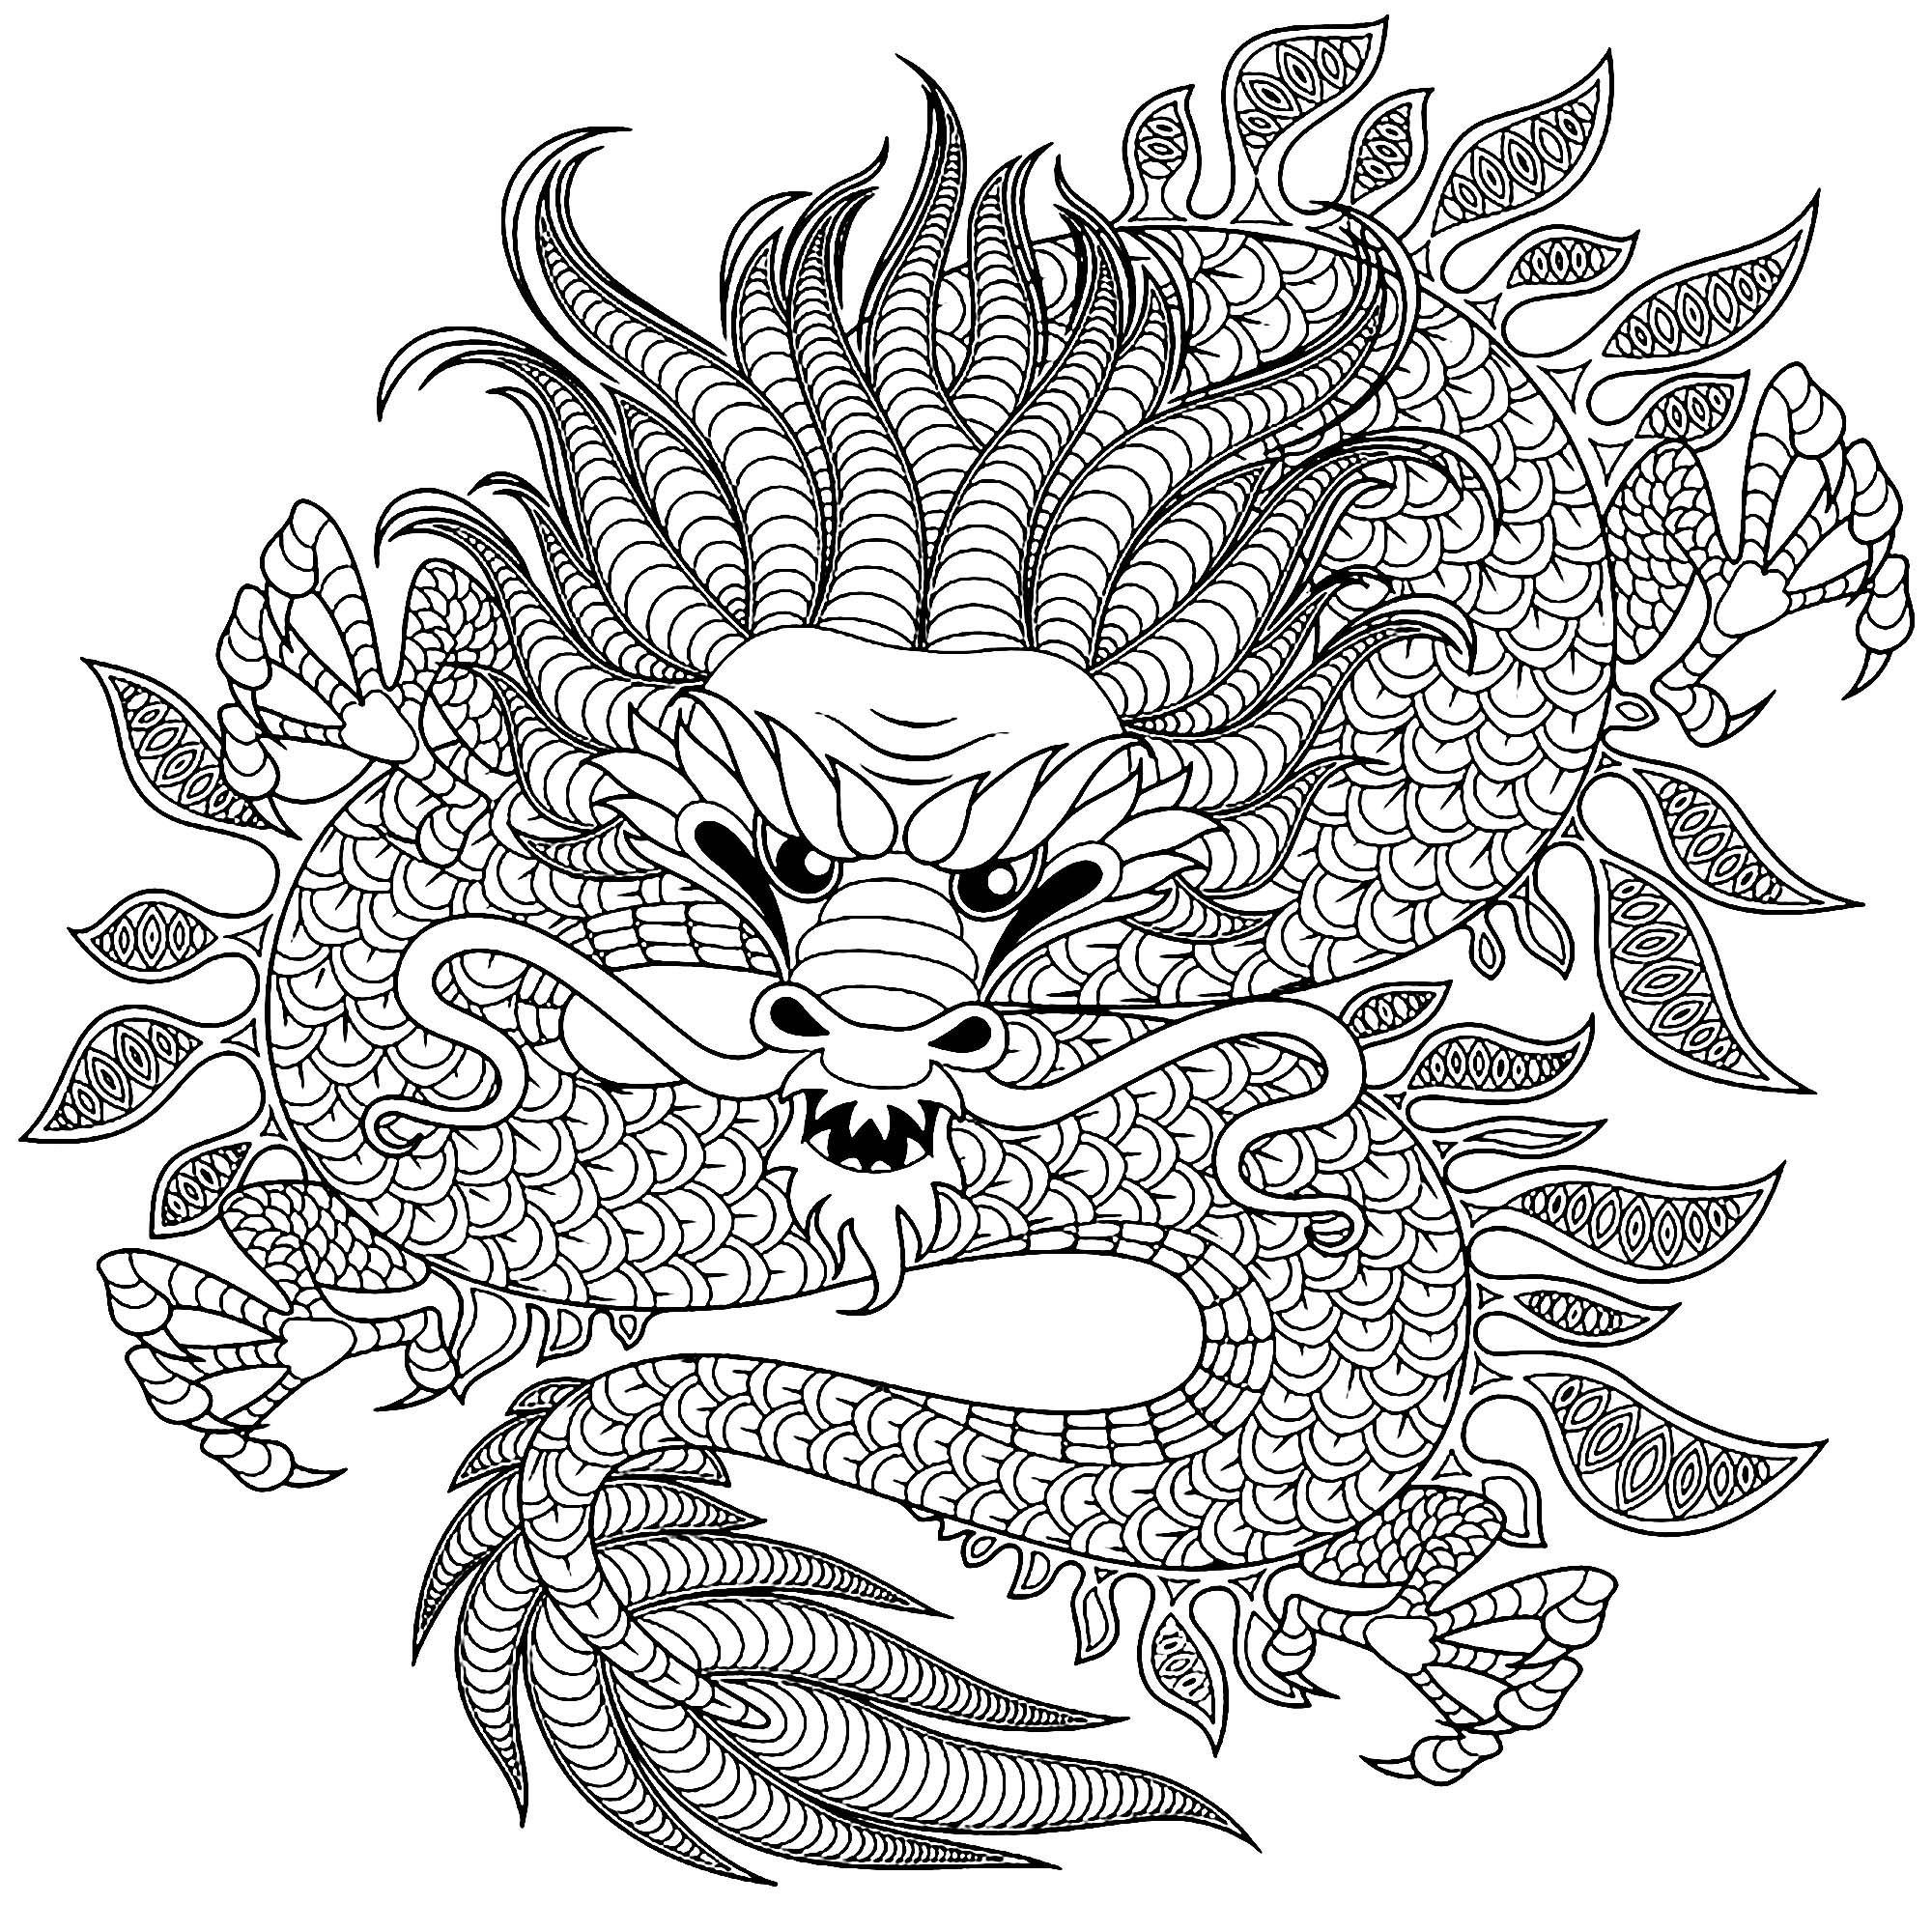 Dragon circular - Dragons Adult Coloring Pages